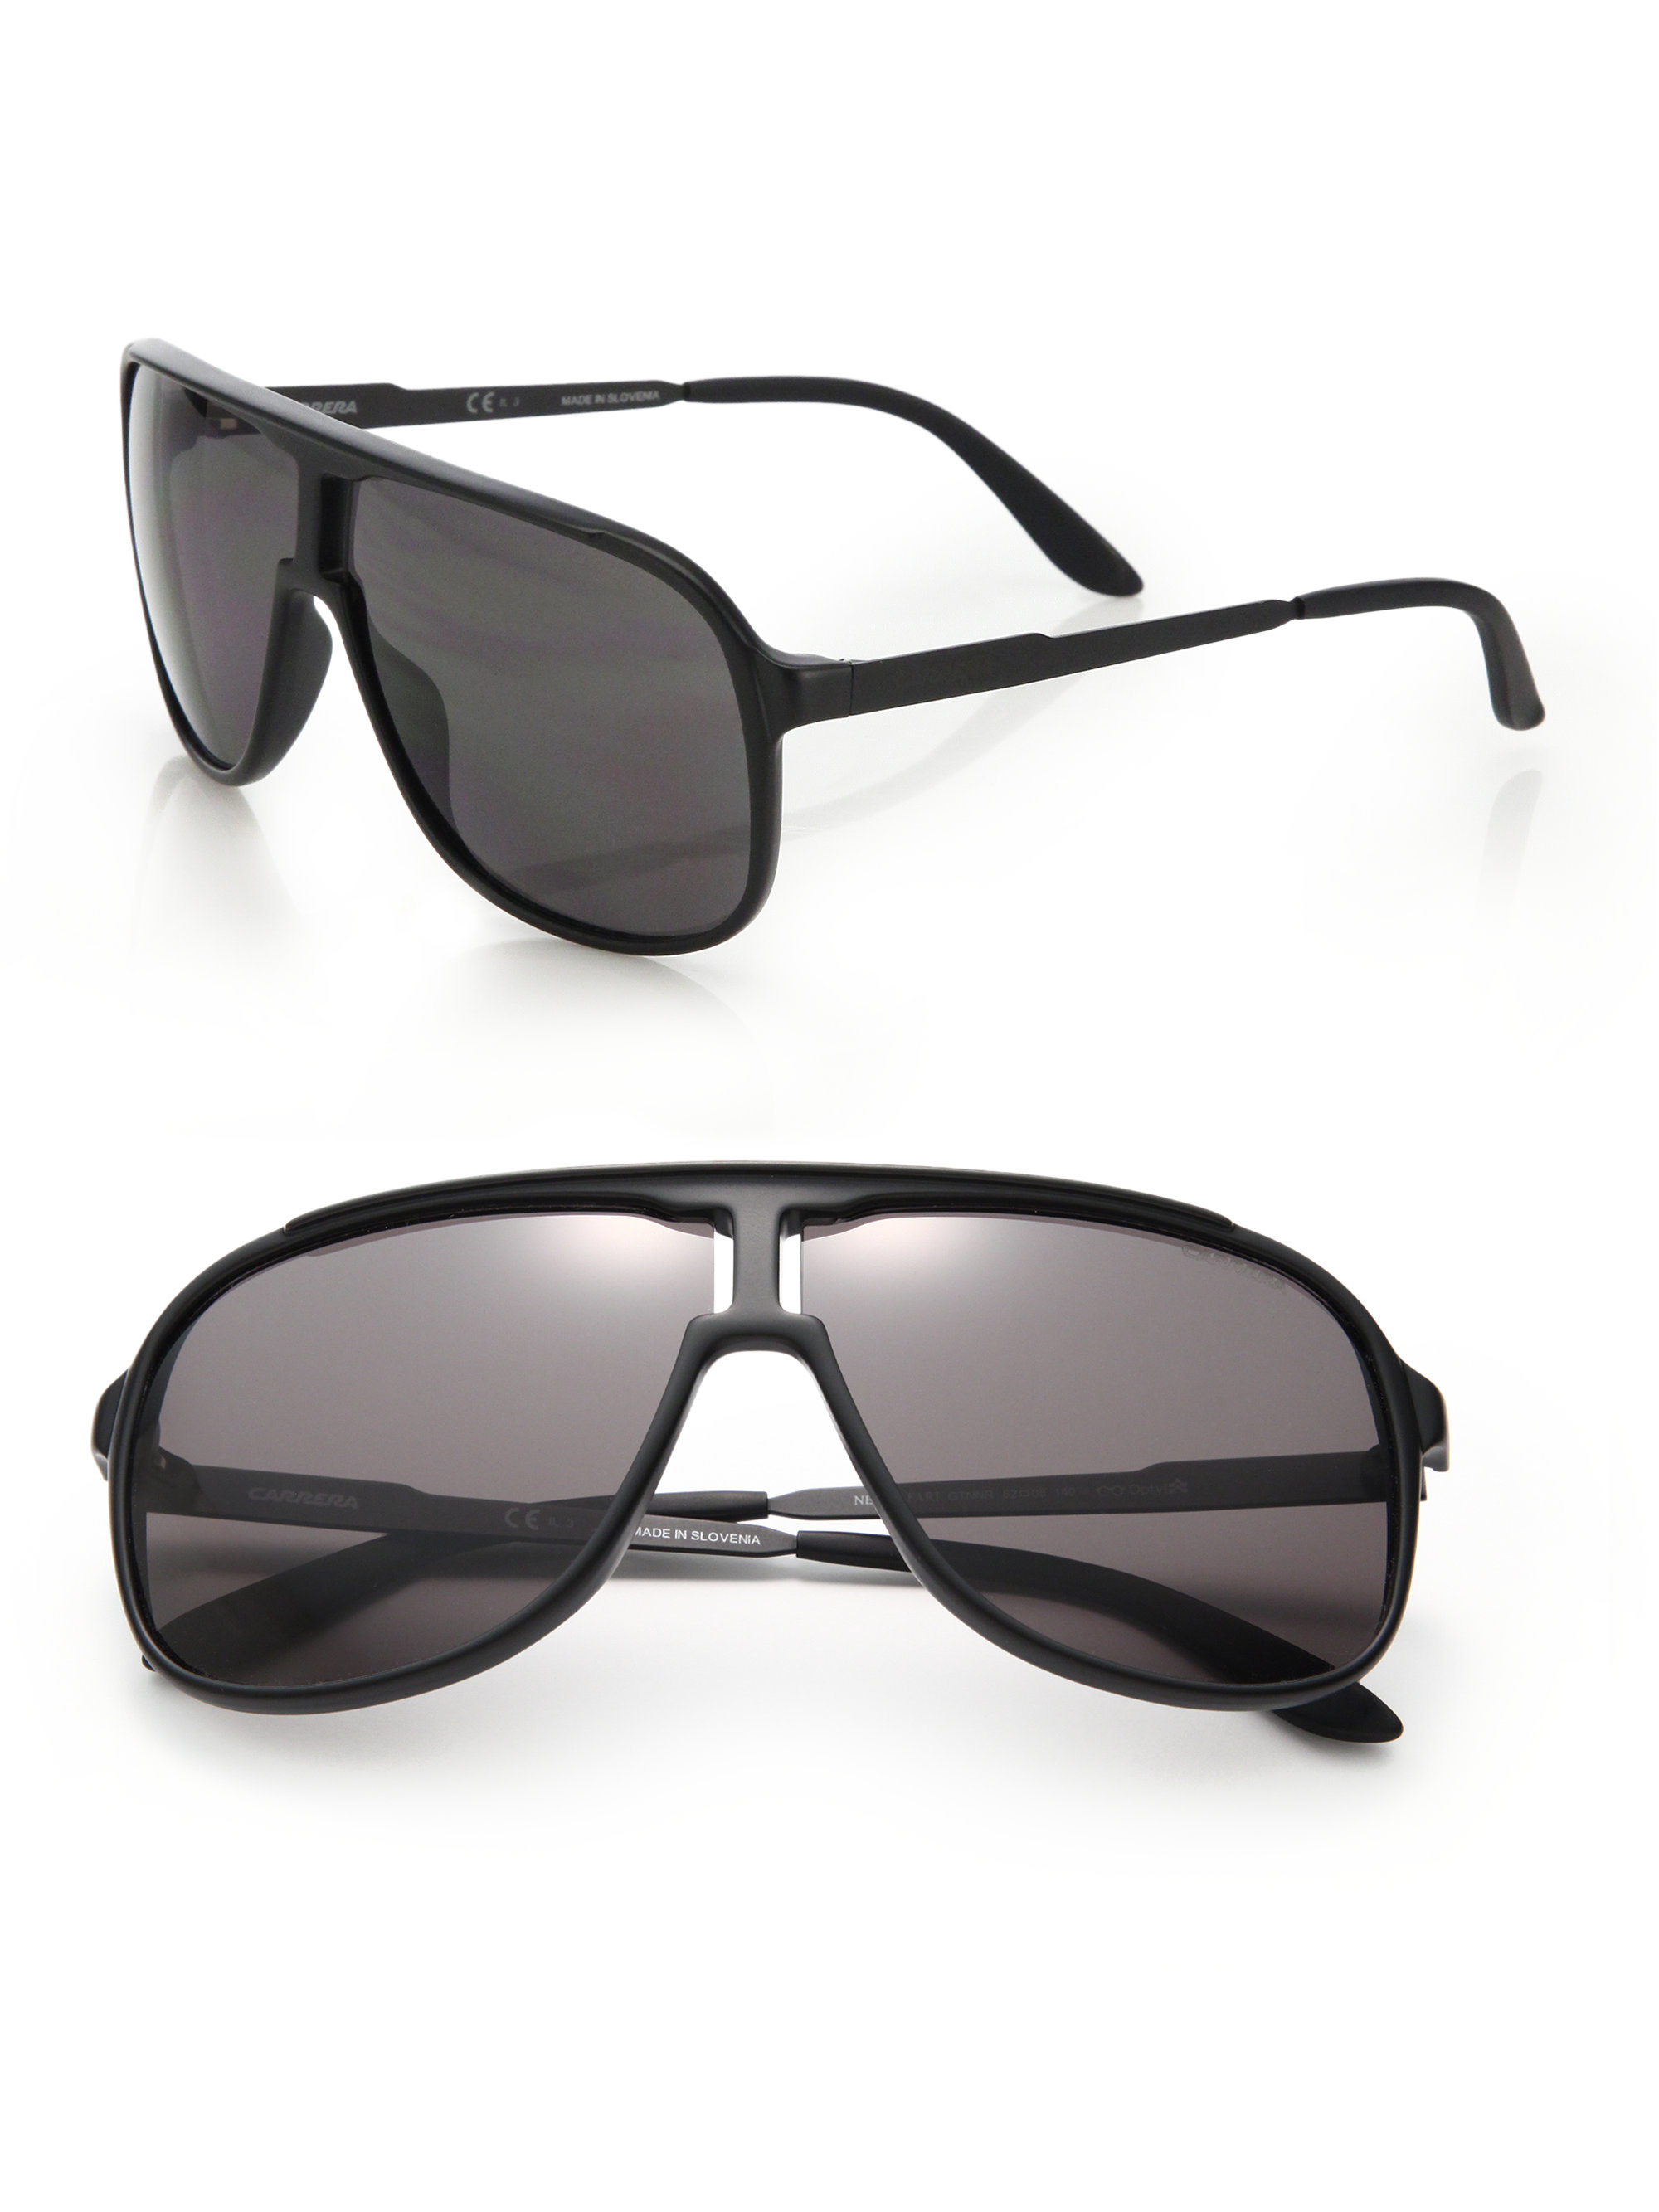 9b3d2ddcf8 Carrera New Safari 62mm Plastic Aviator Sunglasses in Black for Men ...